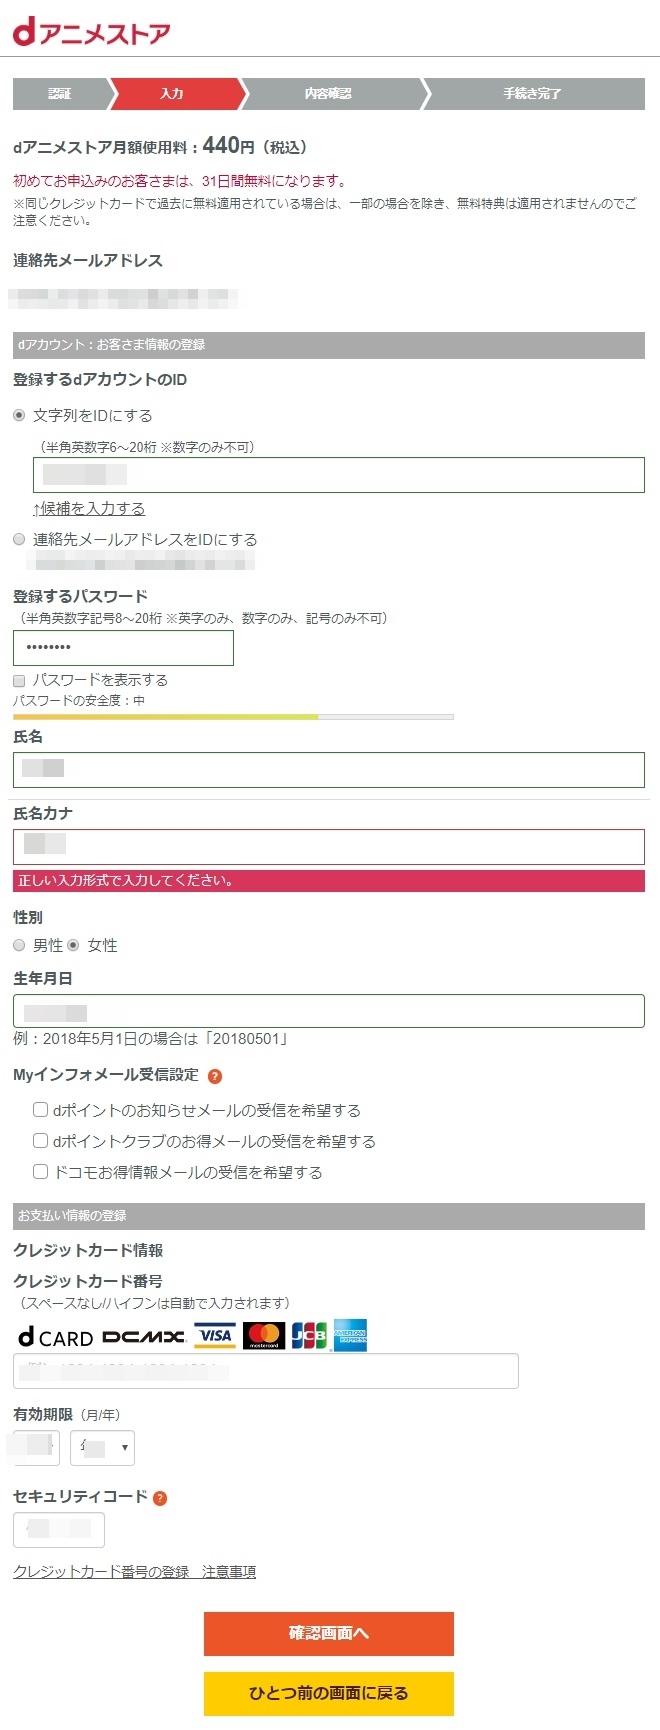 『dアニメストア』登録方法・手順